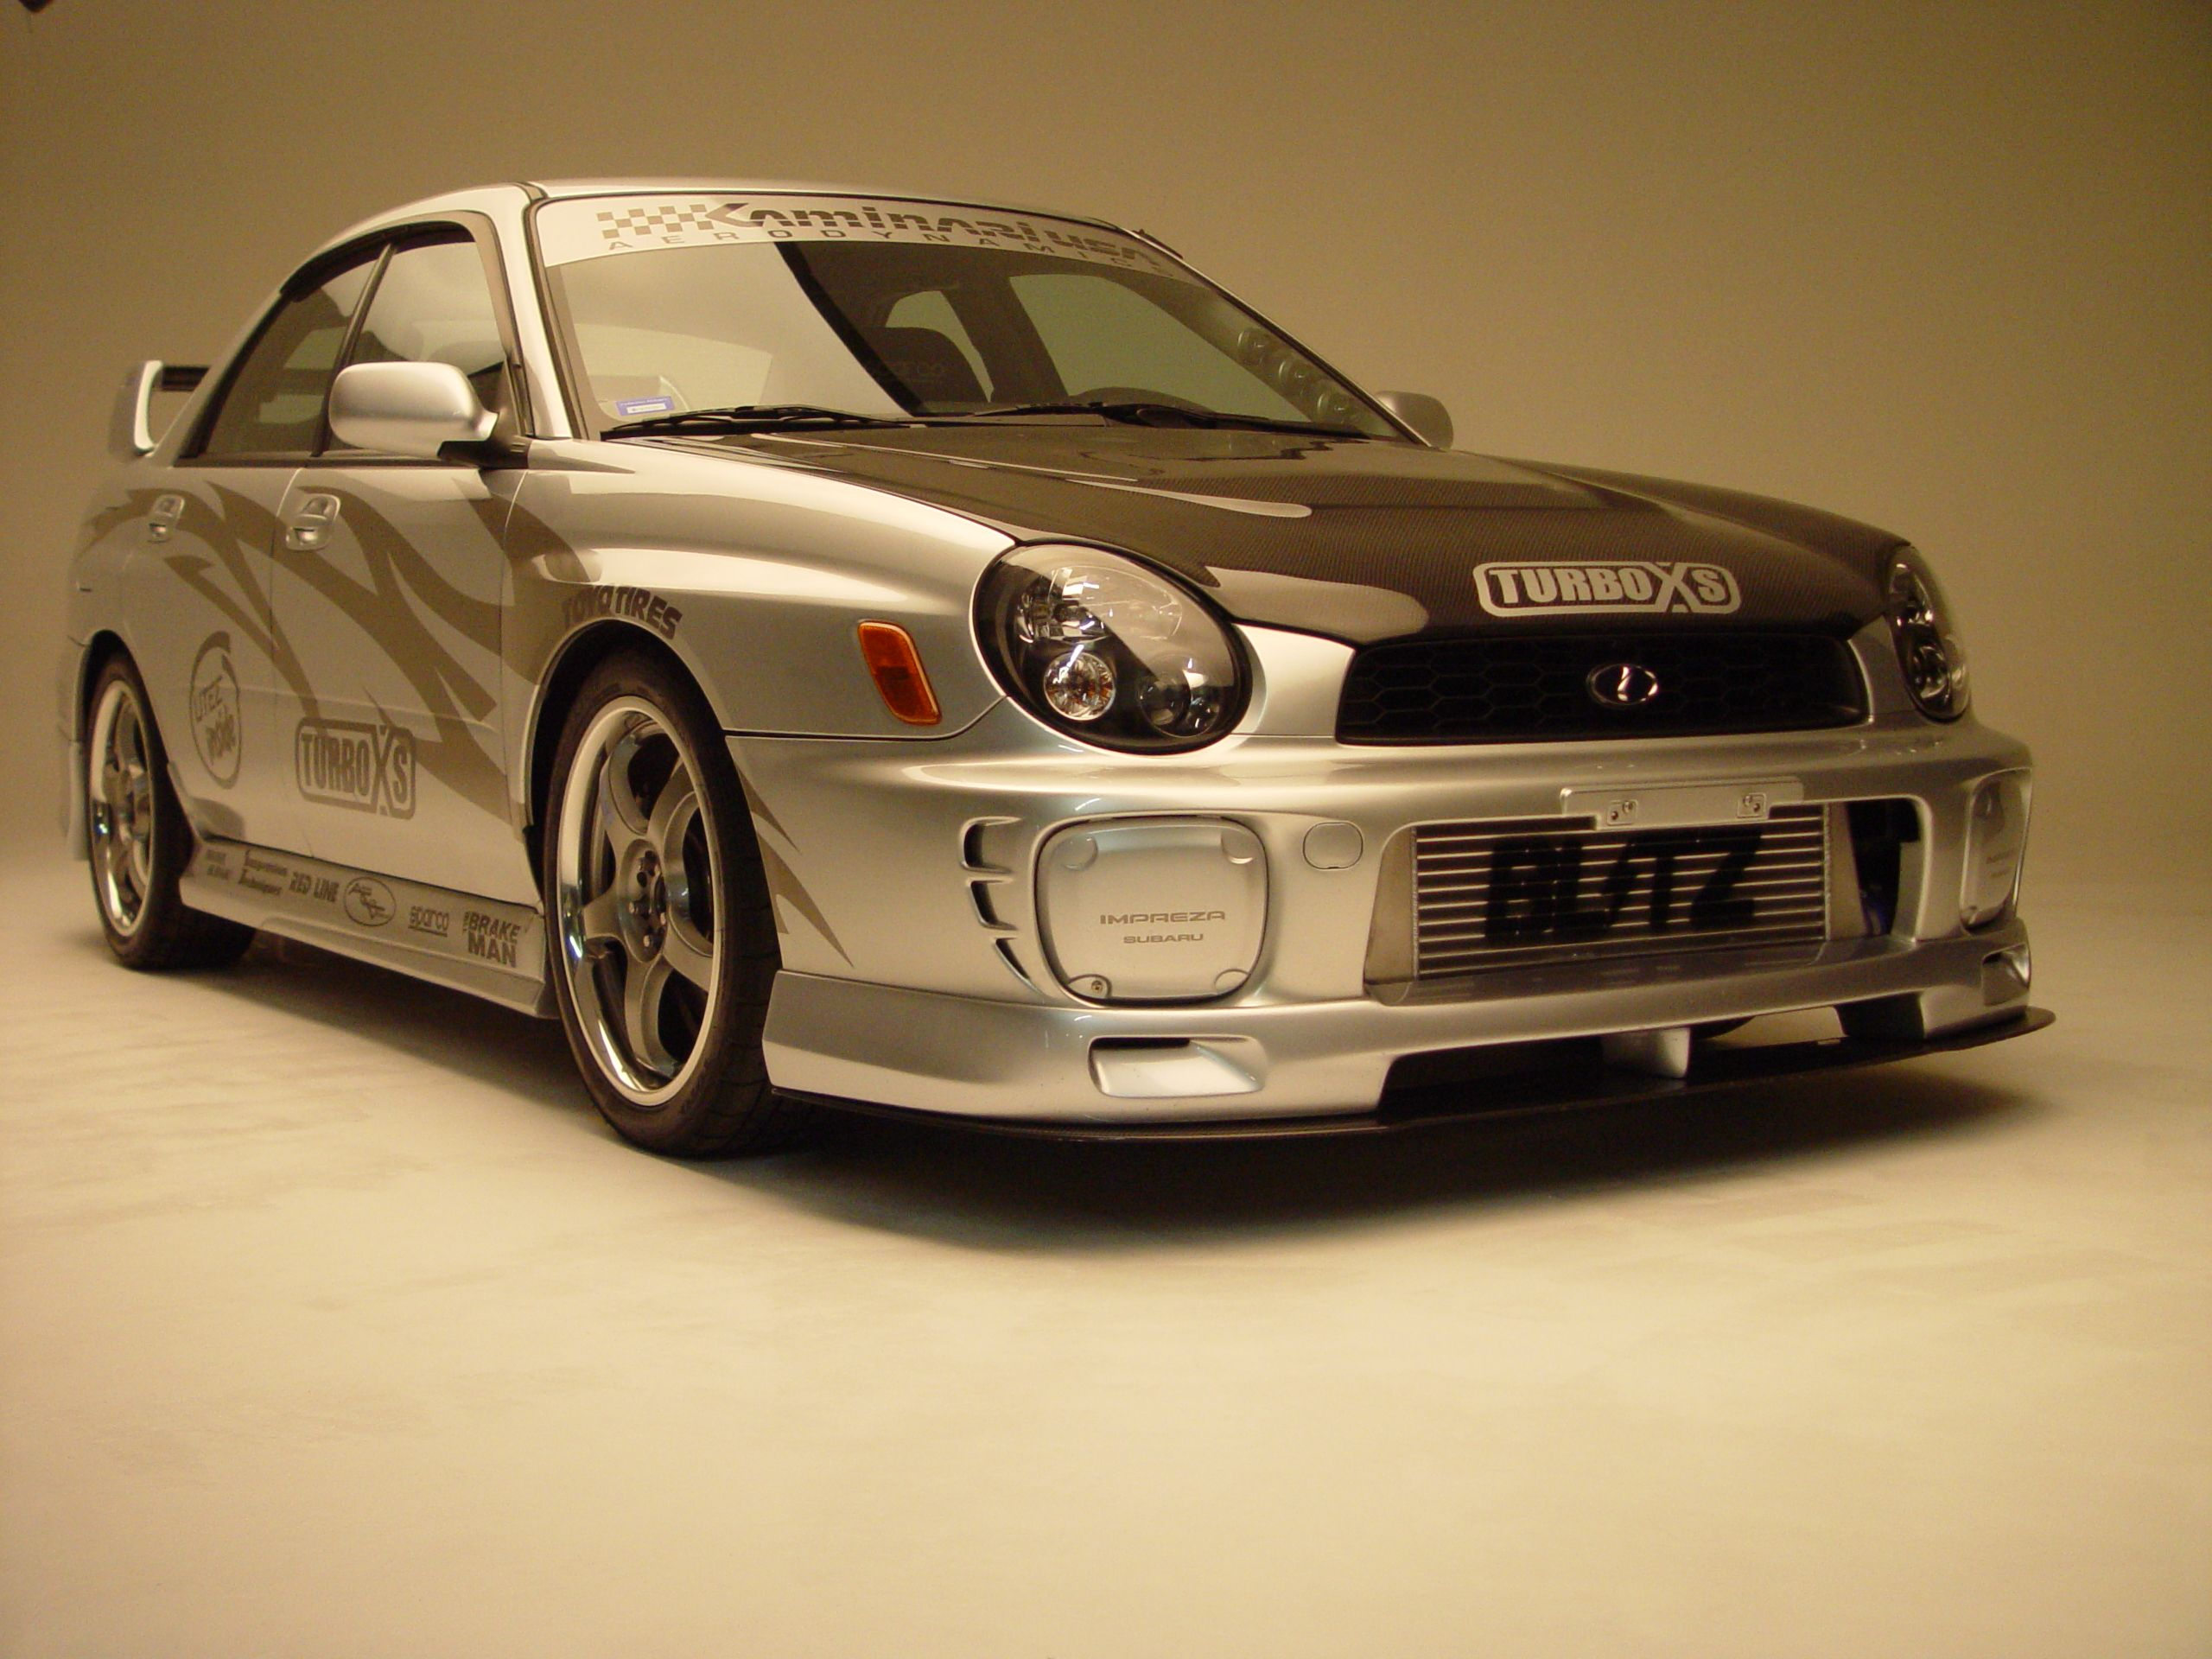 2002 2003 subaru impreza wrx body kit pur frp cars. Black Bedroom Furniture Sets. Home Design Ideas